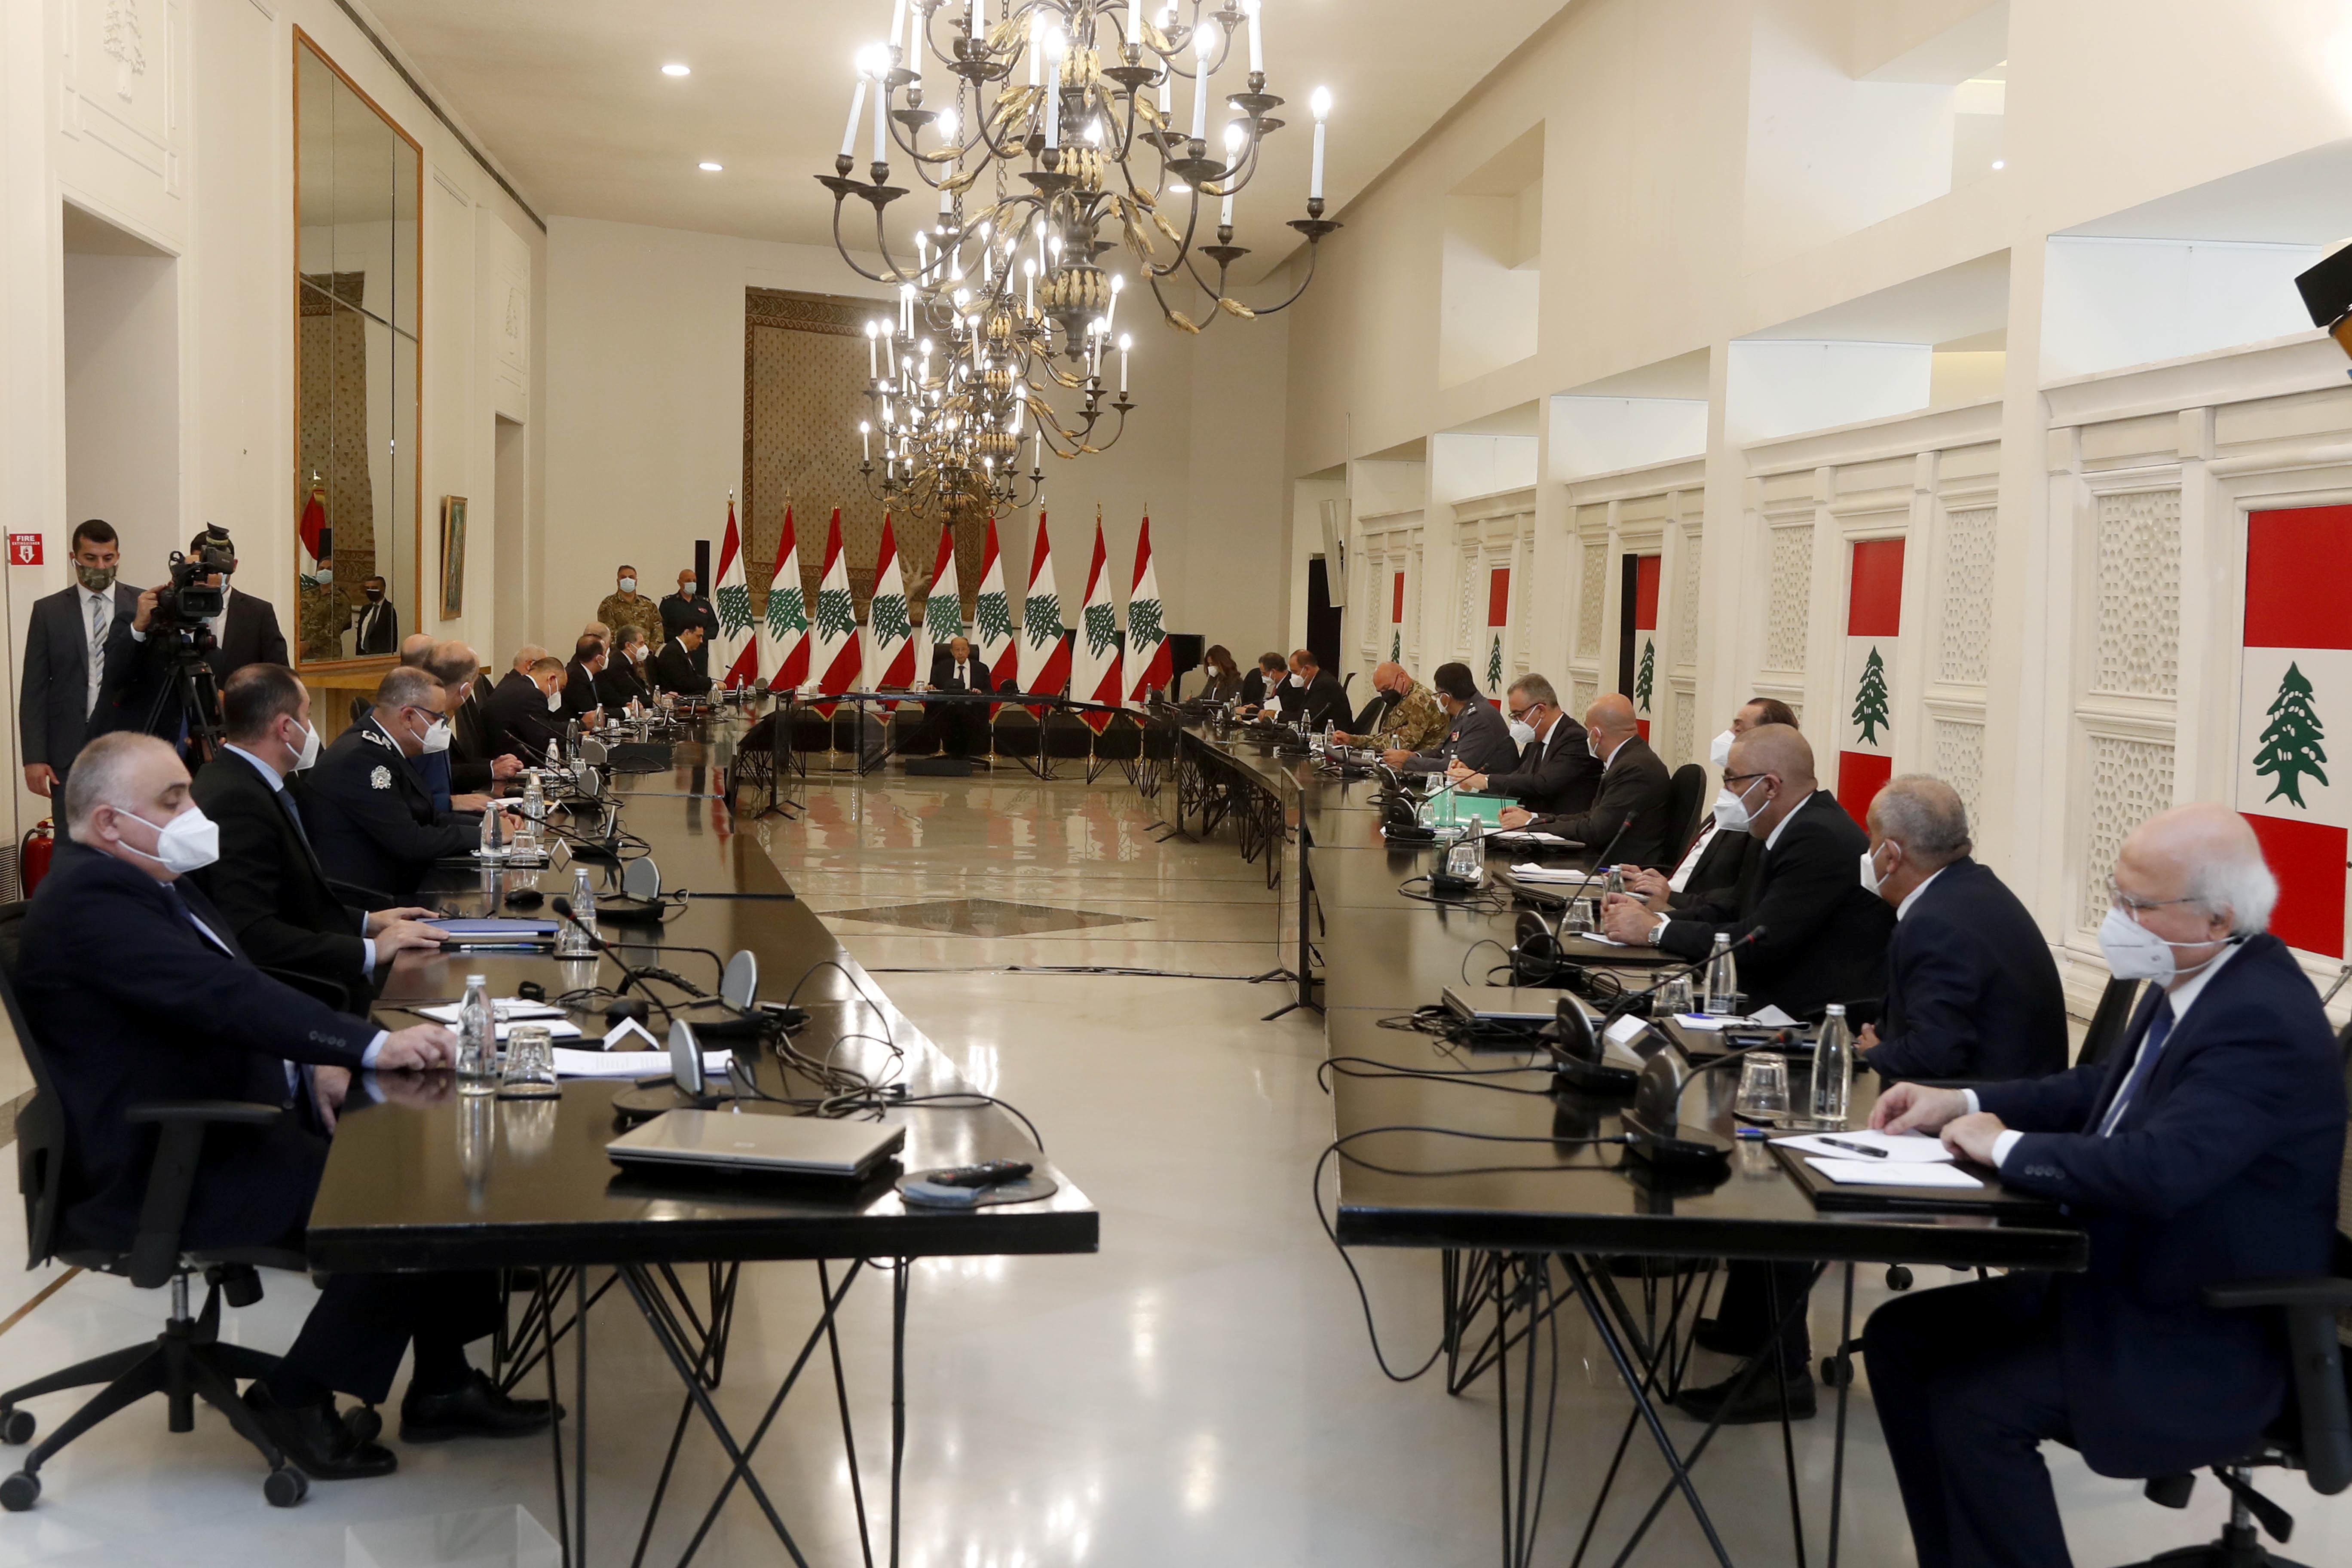 Lebanon's President Michel Aoun heads a meeting with Lebanese officials at the presidential palace in Baabda, Lebanon April 26, 2021. Dalati Nohra/Handout via REUTERS